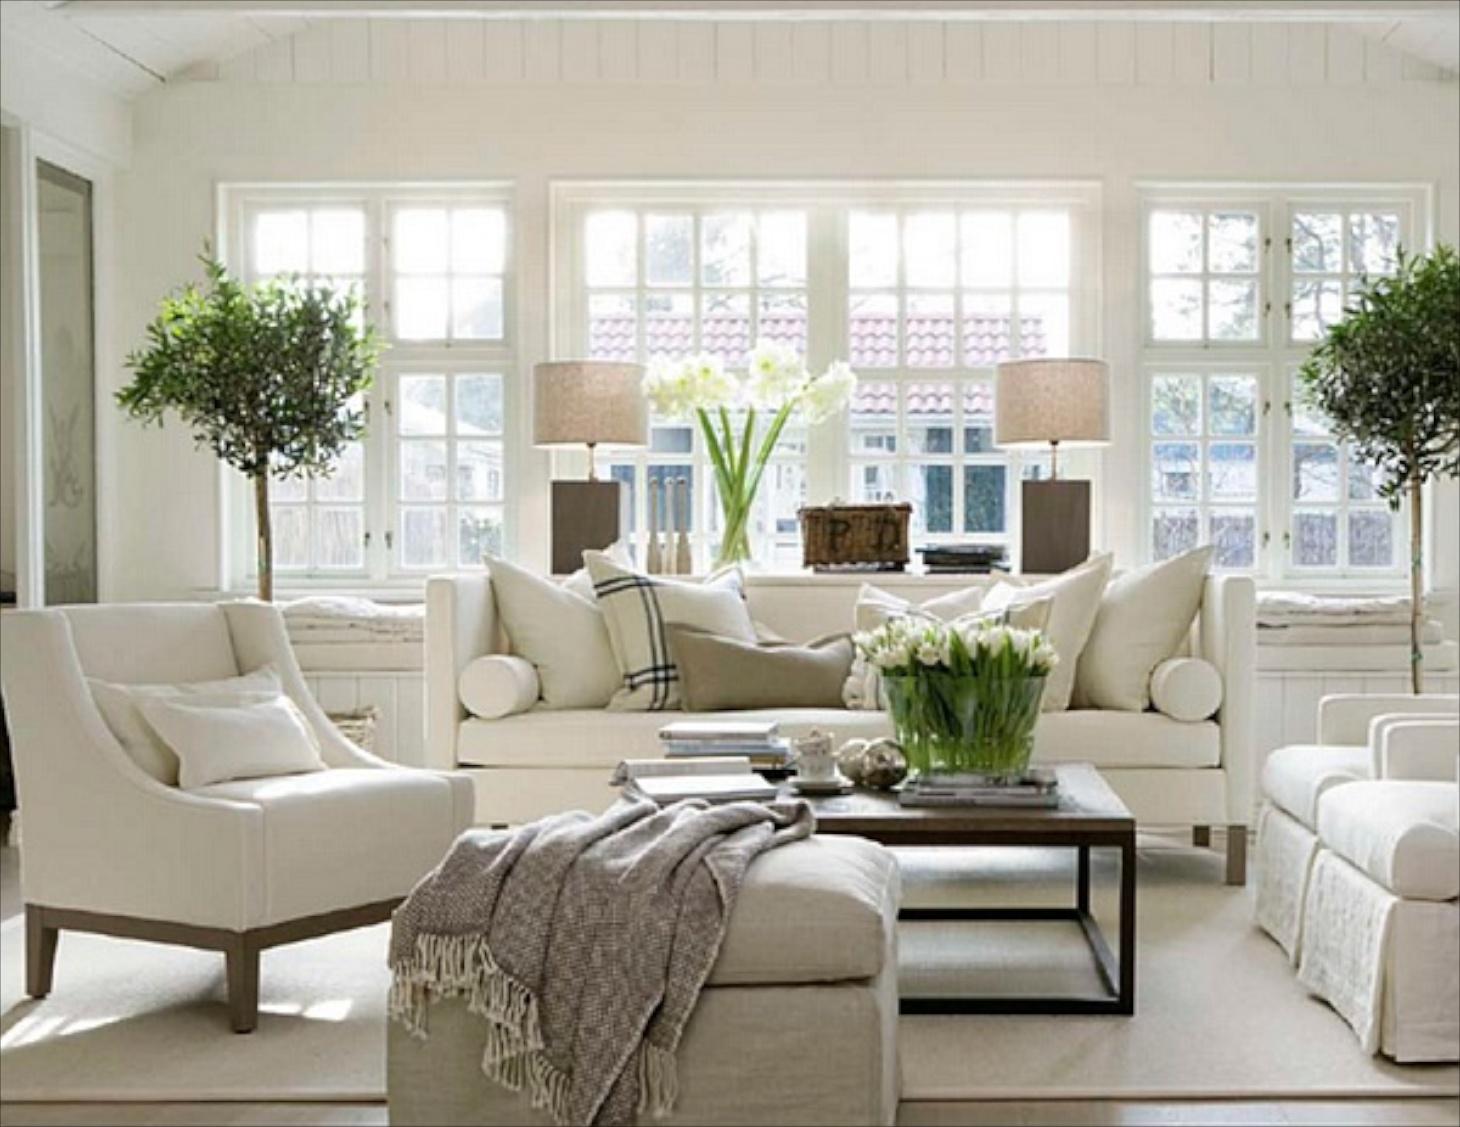 beautiful living room plant images - britishpatriotssociety